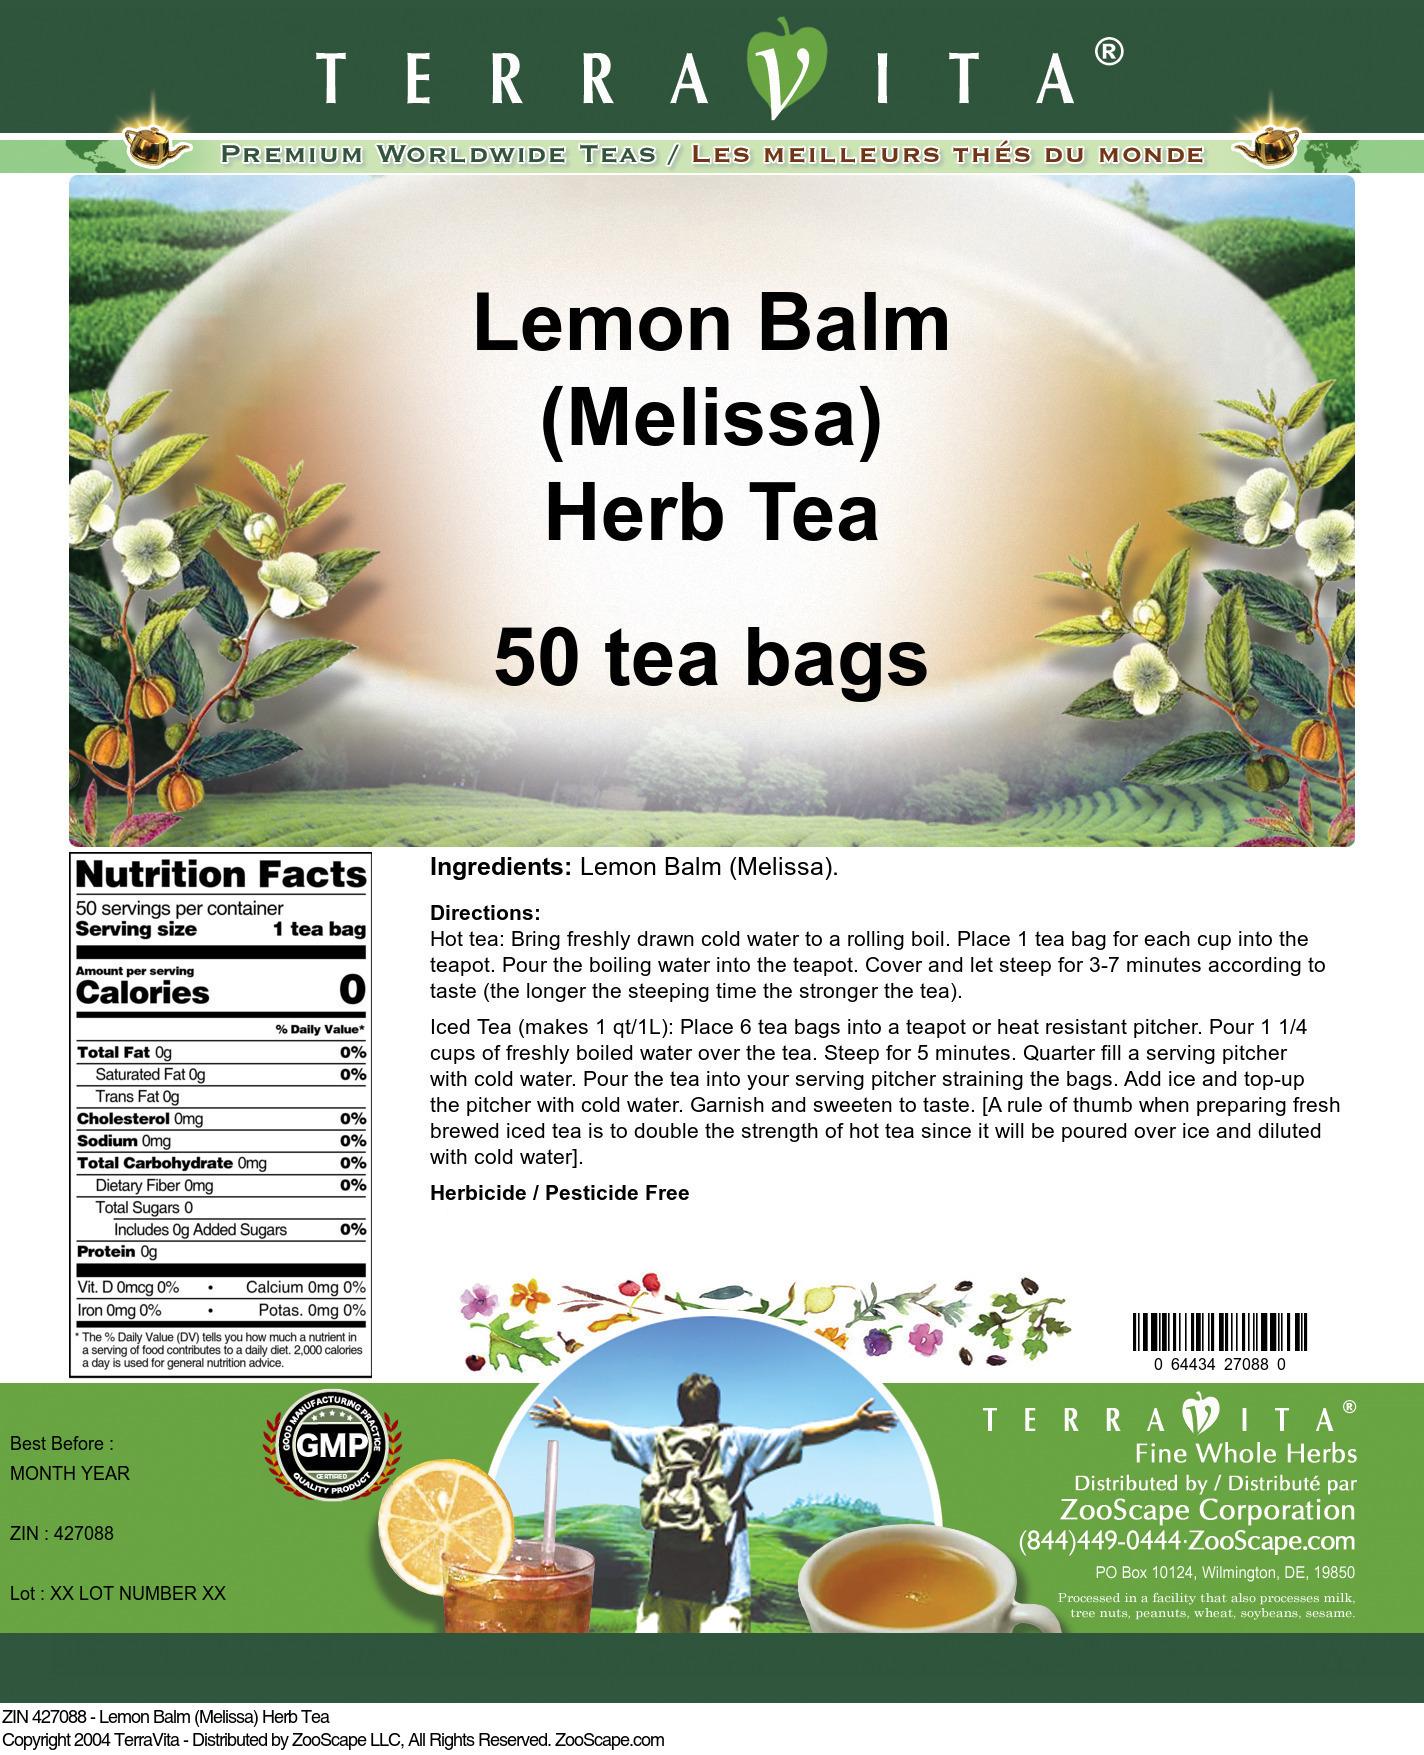 Lemon Balm (Melissa) Herb Tea - Label